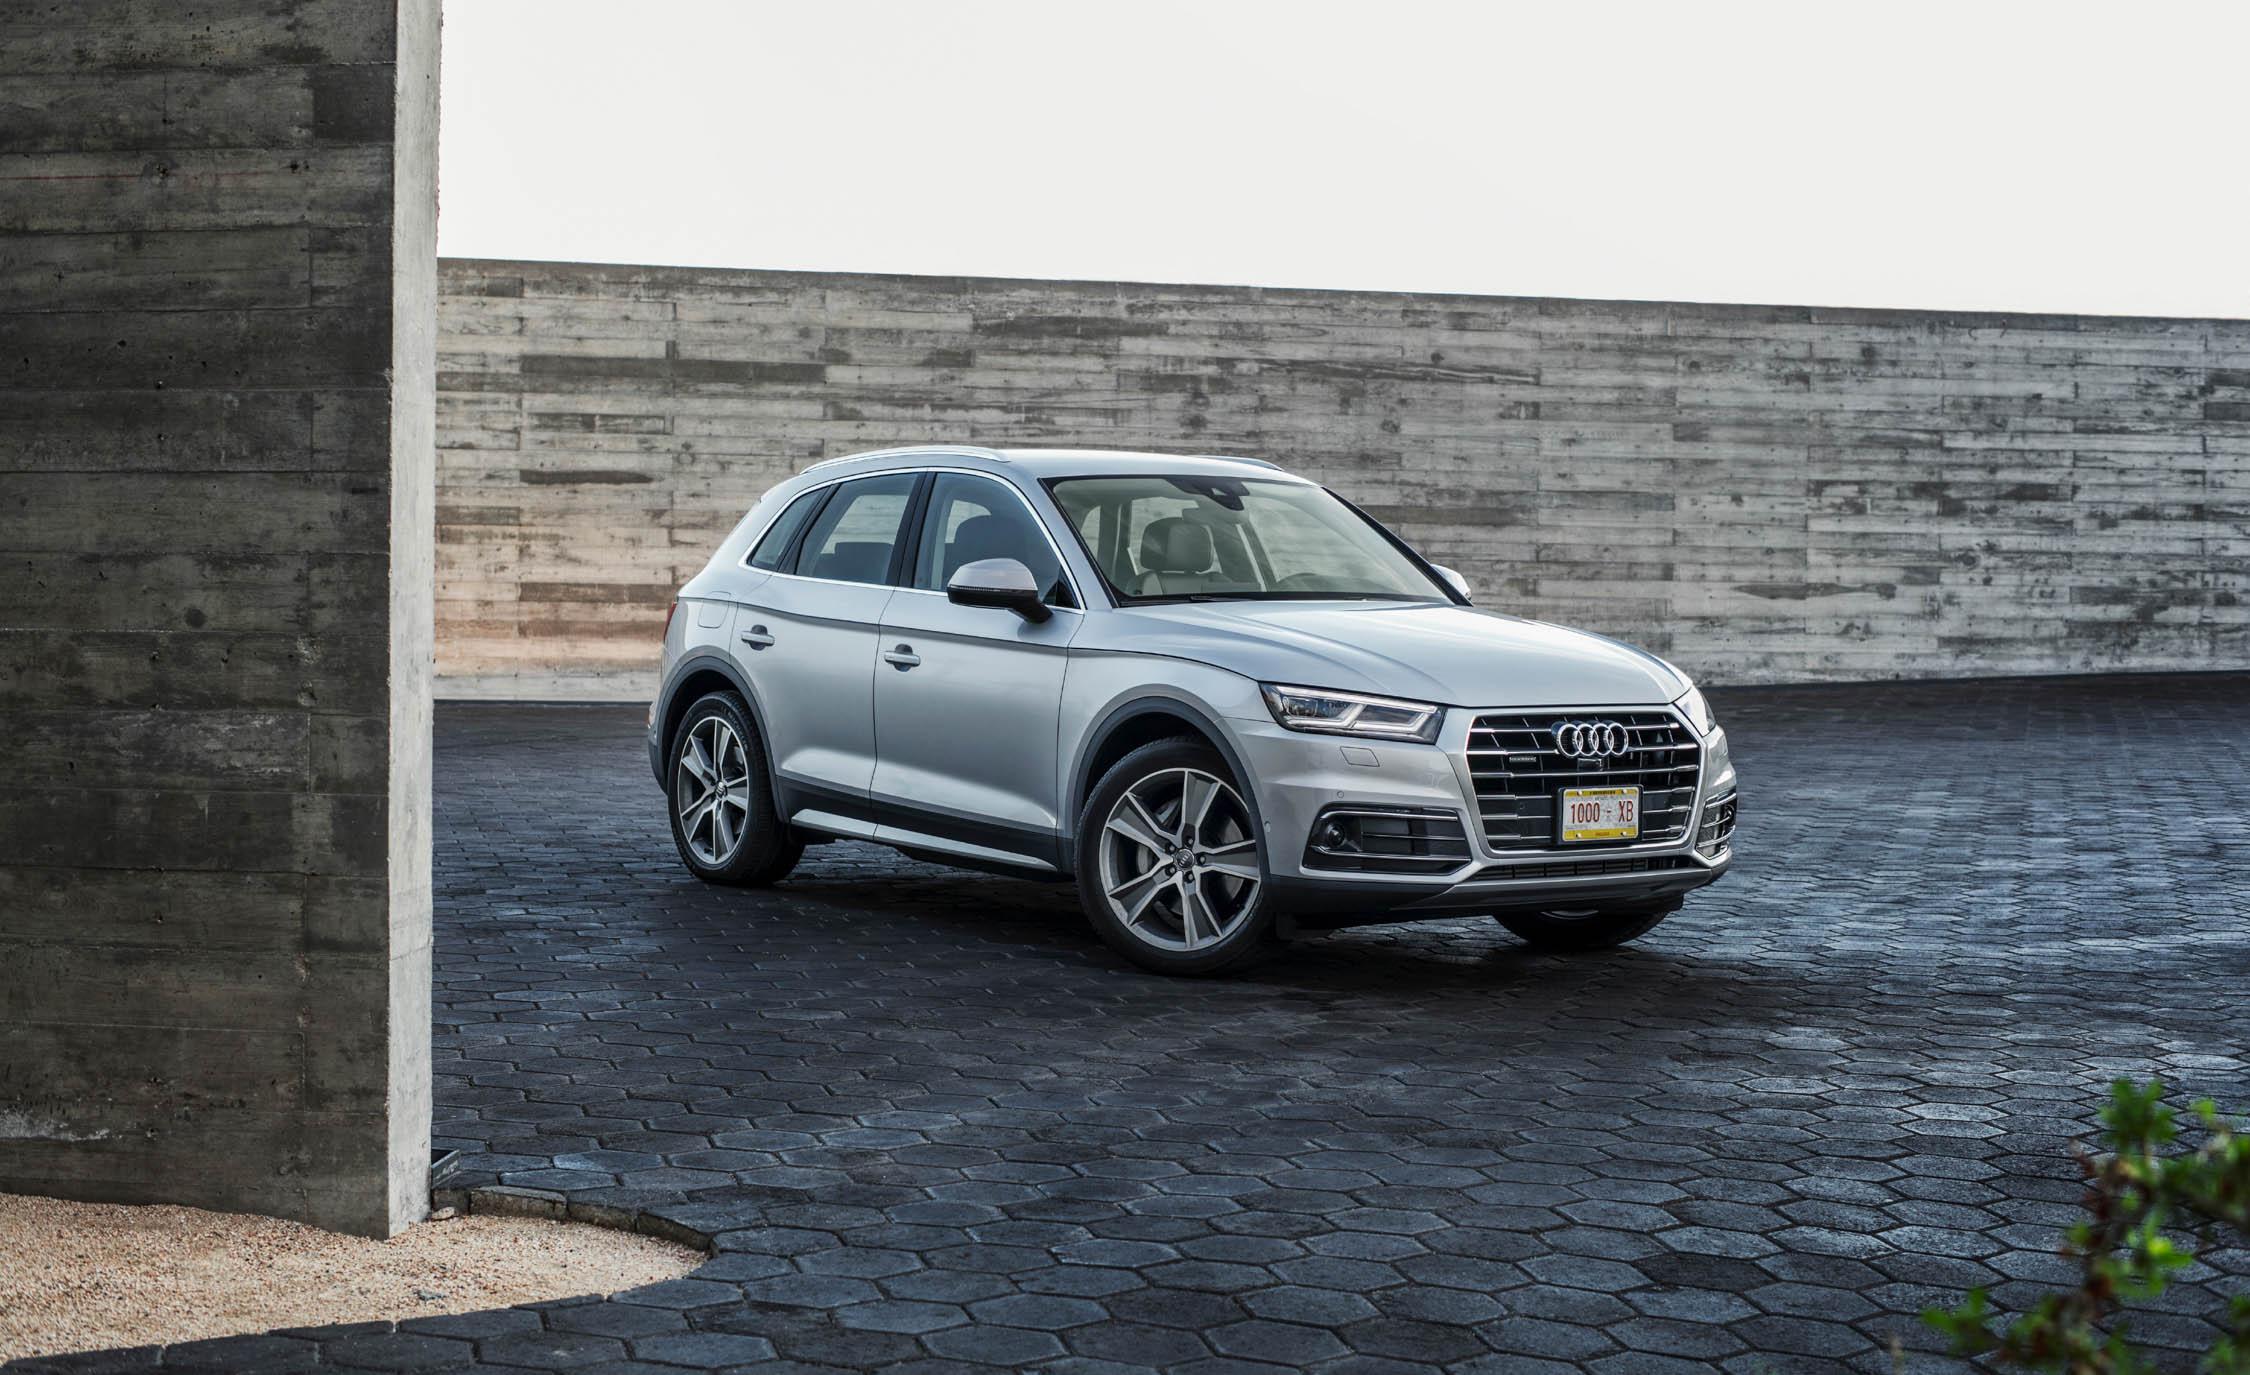 2018 Audi Q (Photo 1 of 40)